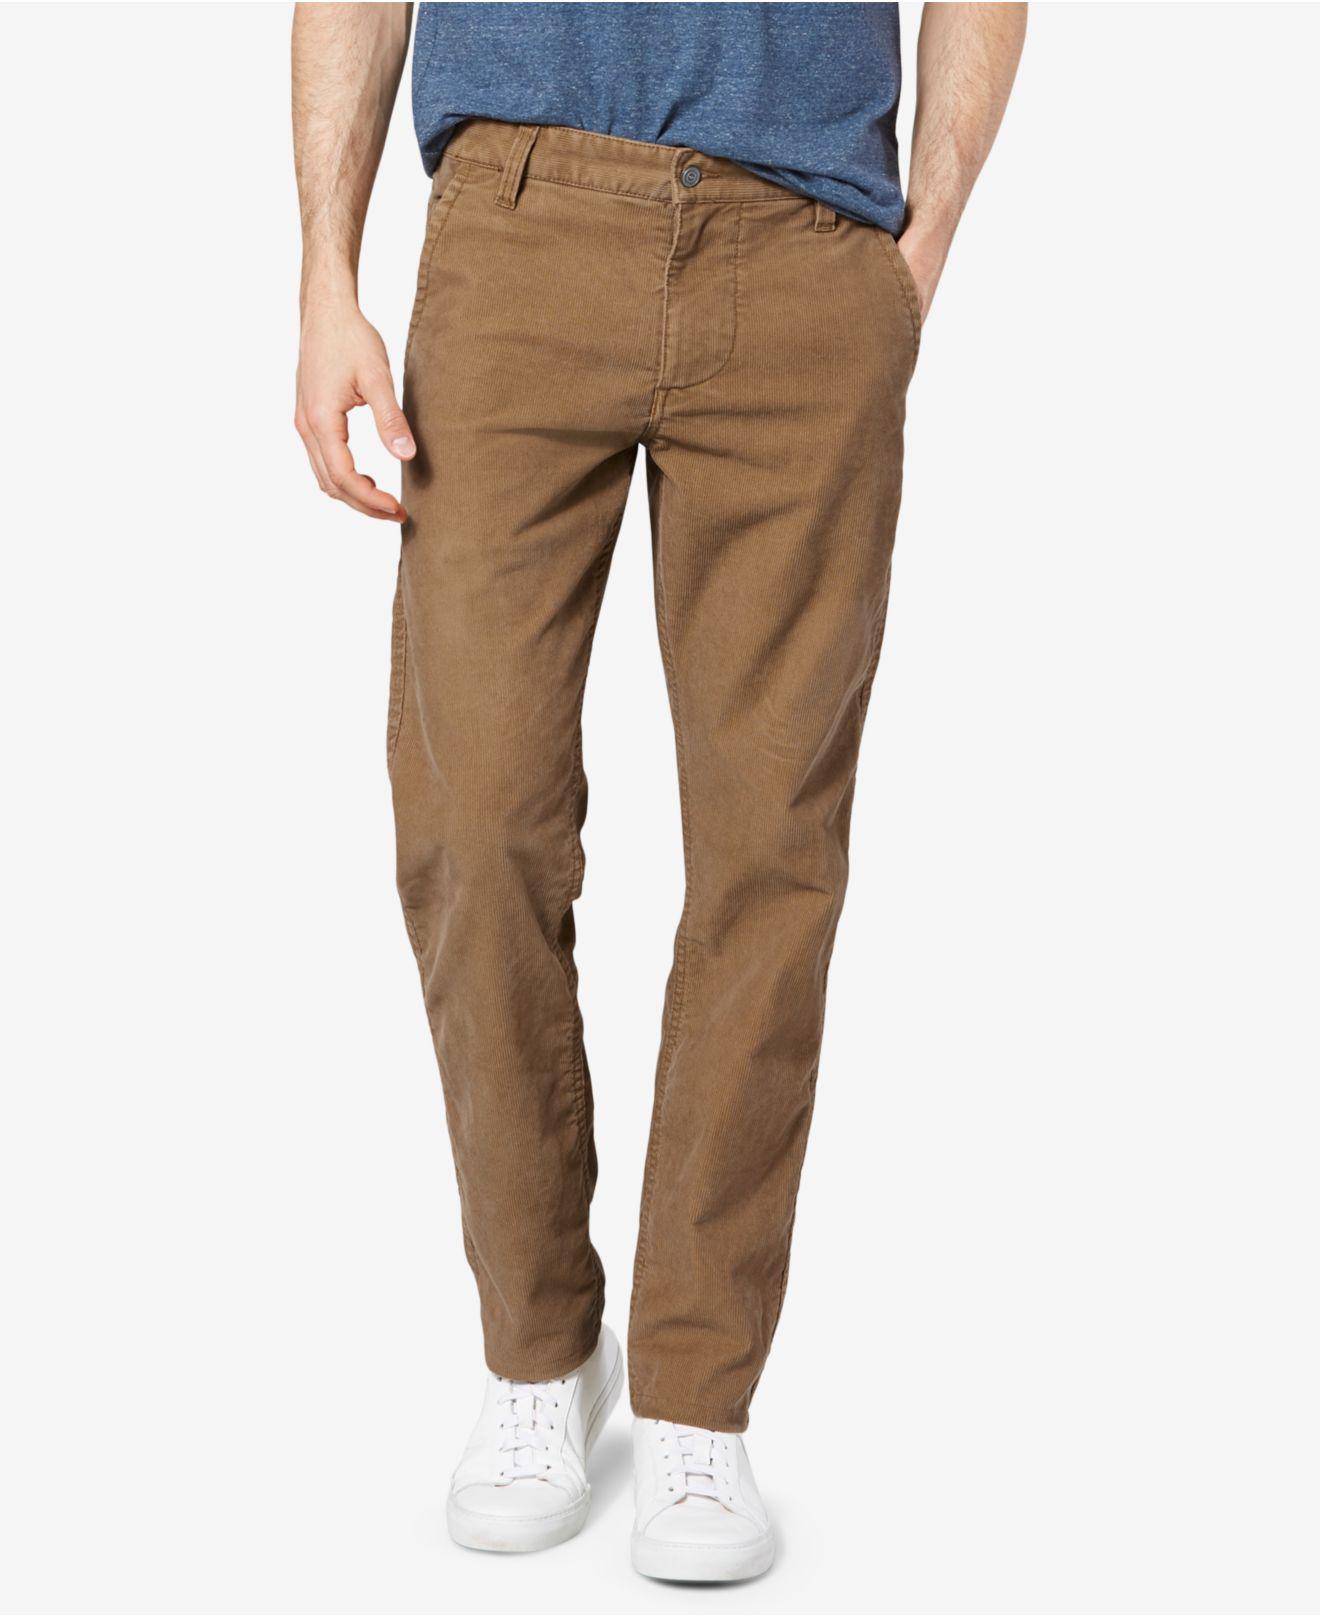 Dockers Men/'s Black The Broken In Alpha Khaki Slim Tapered  Fit Pants